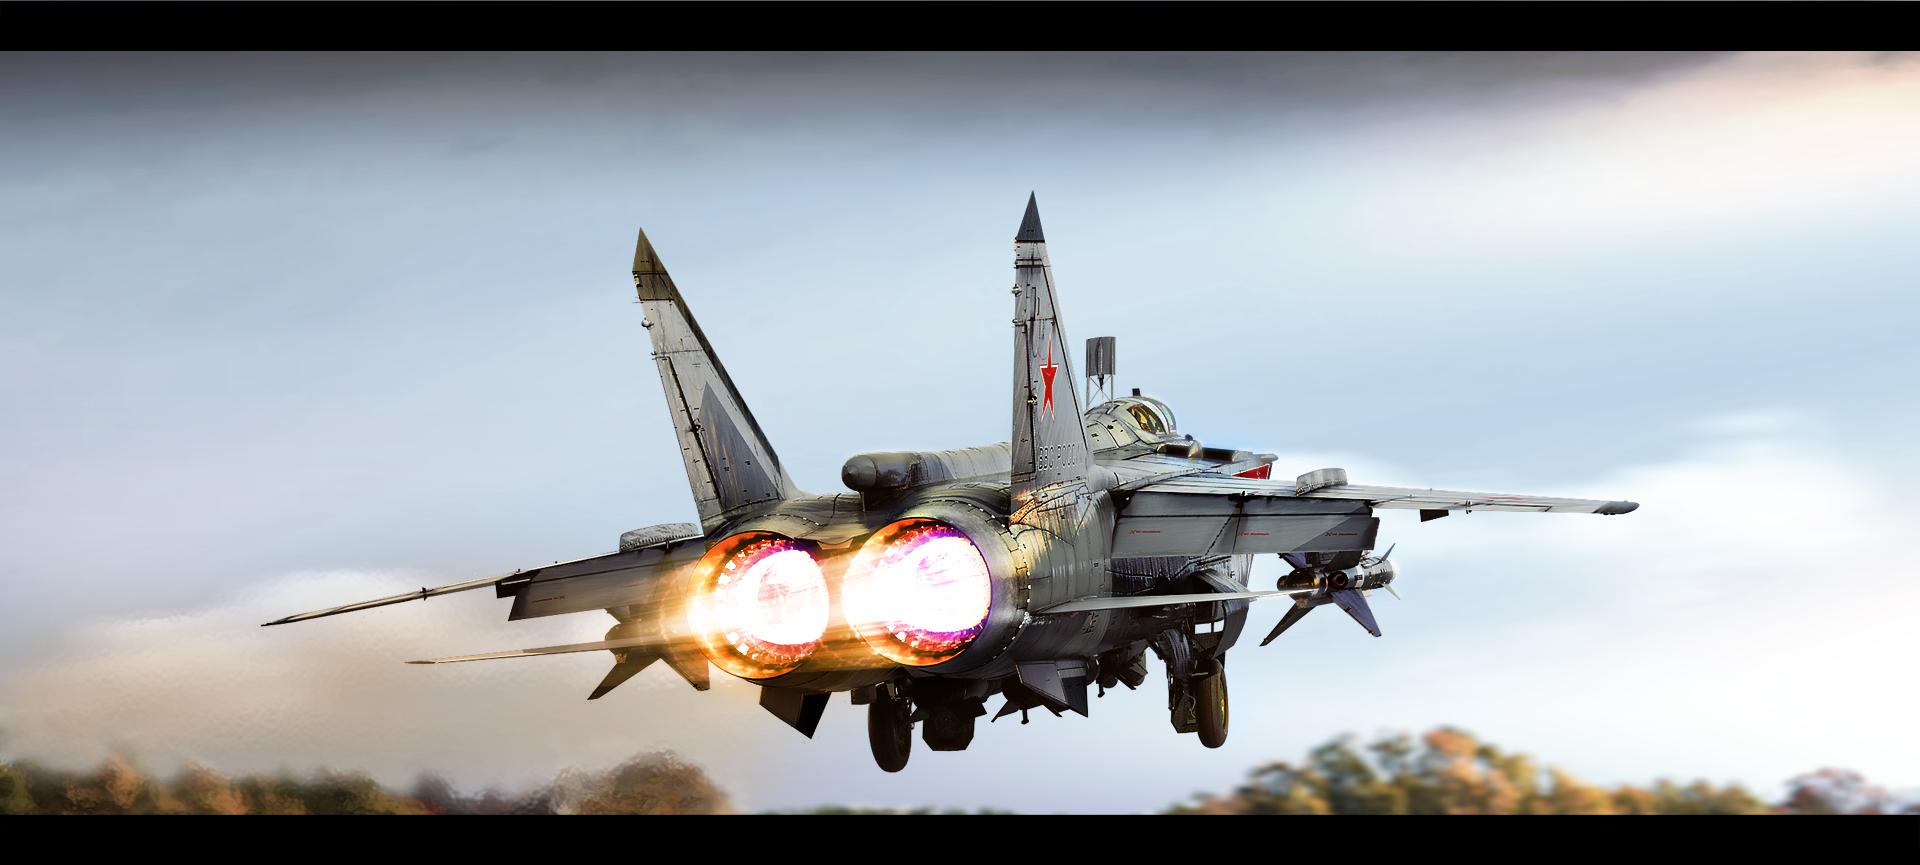 Afterburner 304 kN by ABiator